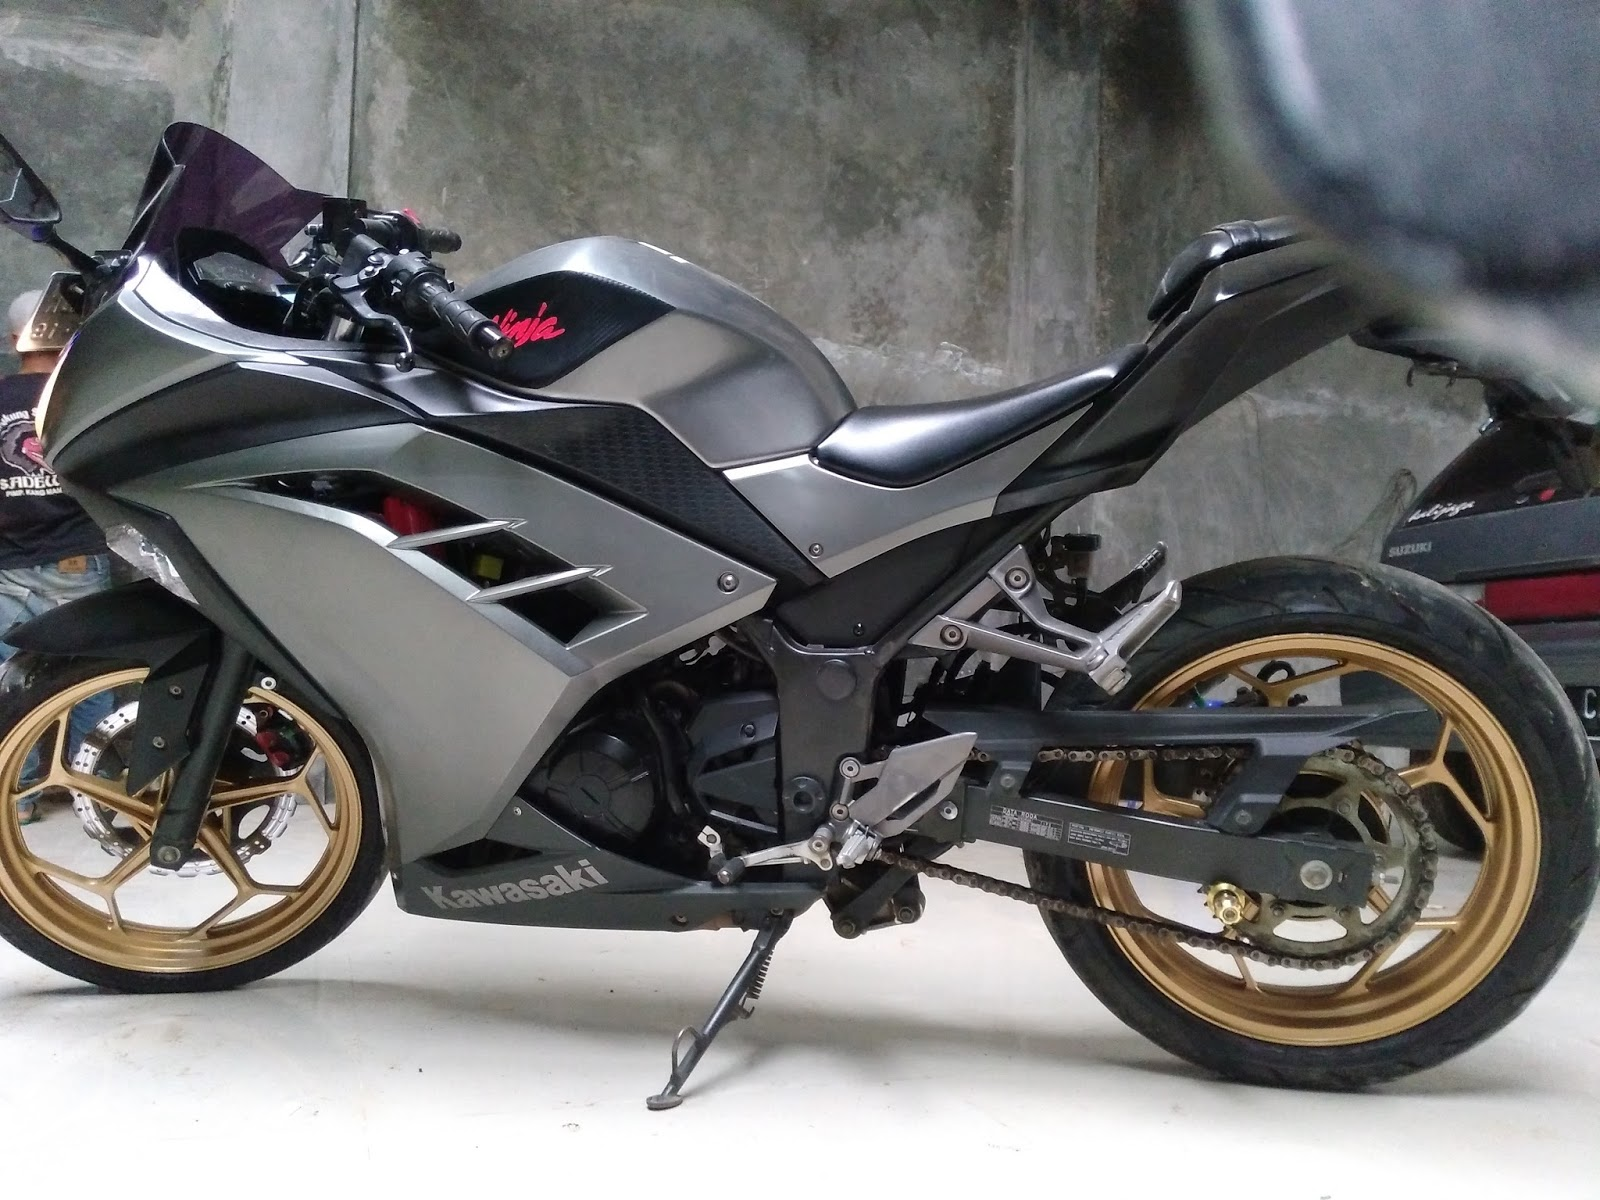 .: Dijual Kawasaki Ninja 250cc tahun 2013 injection,abu